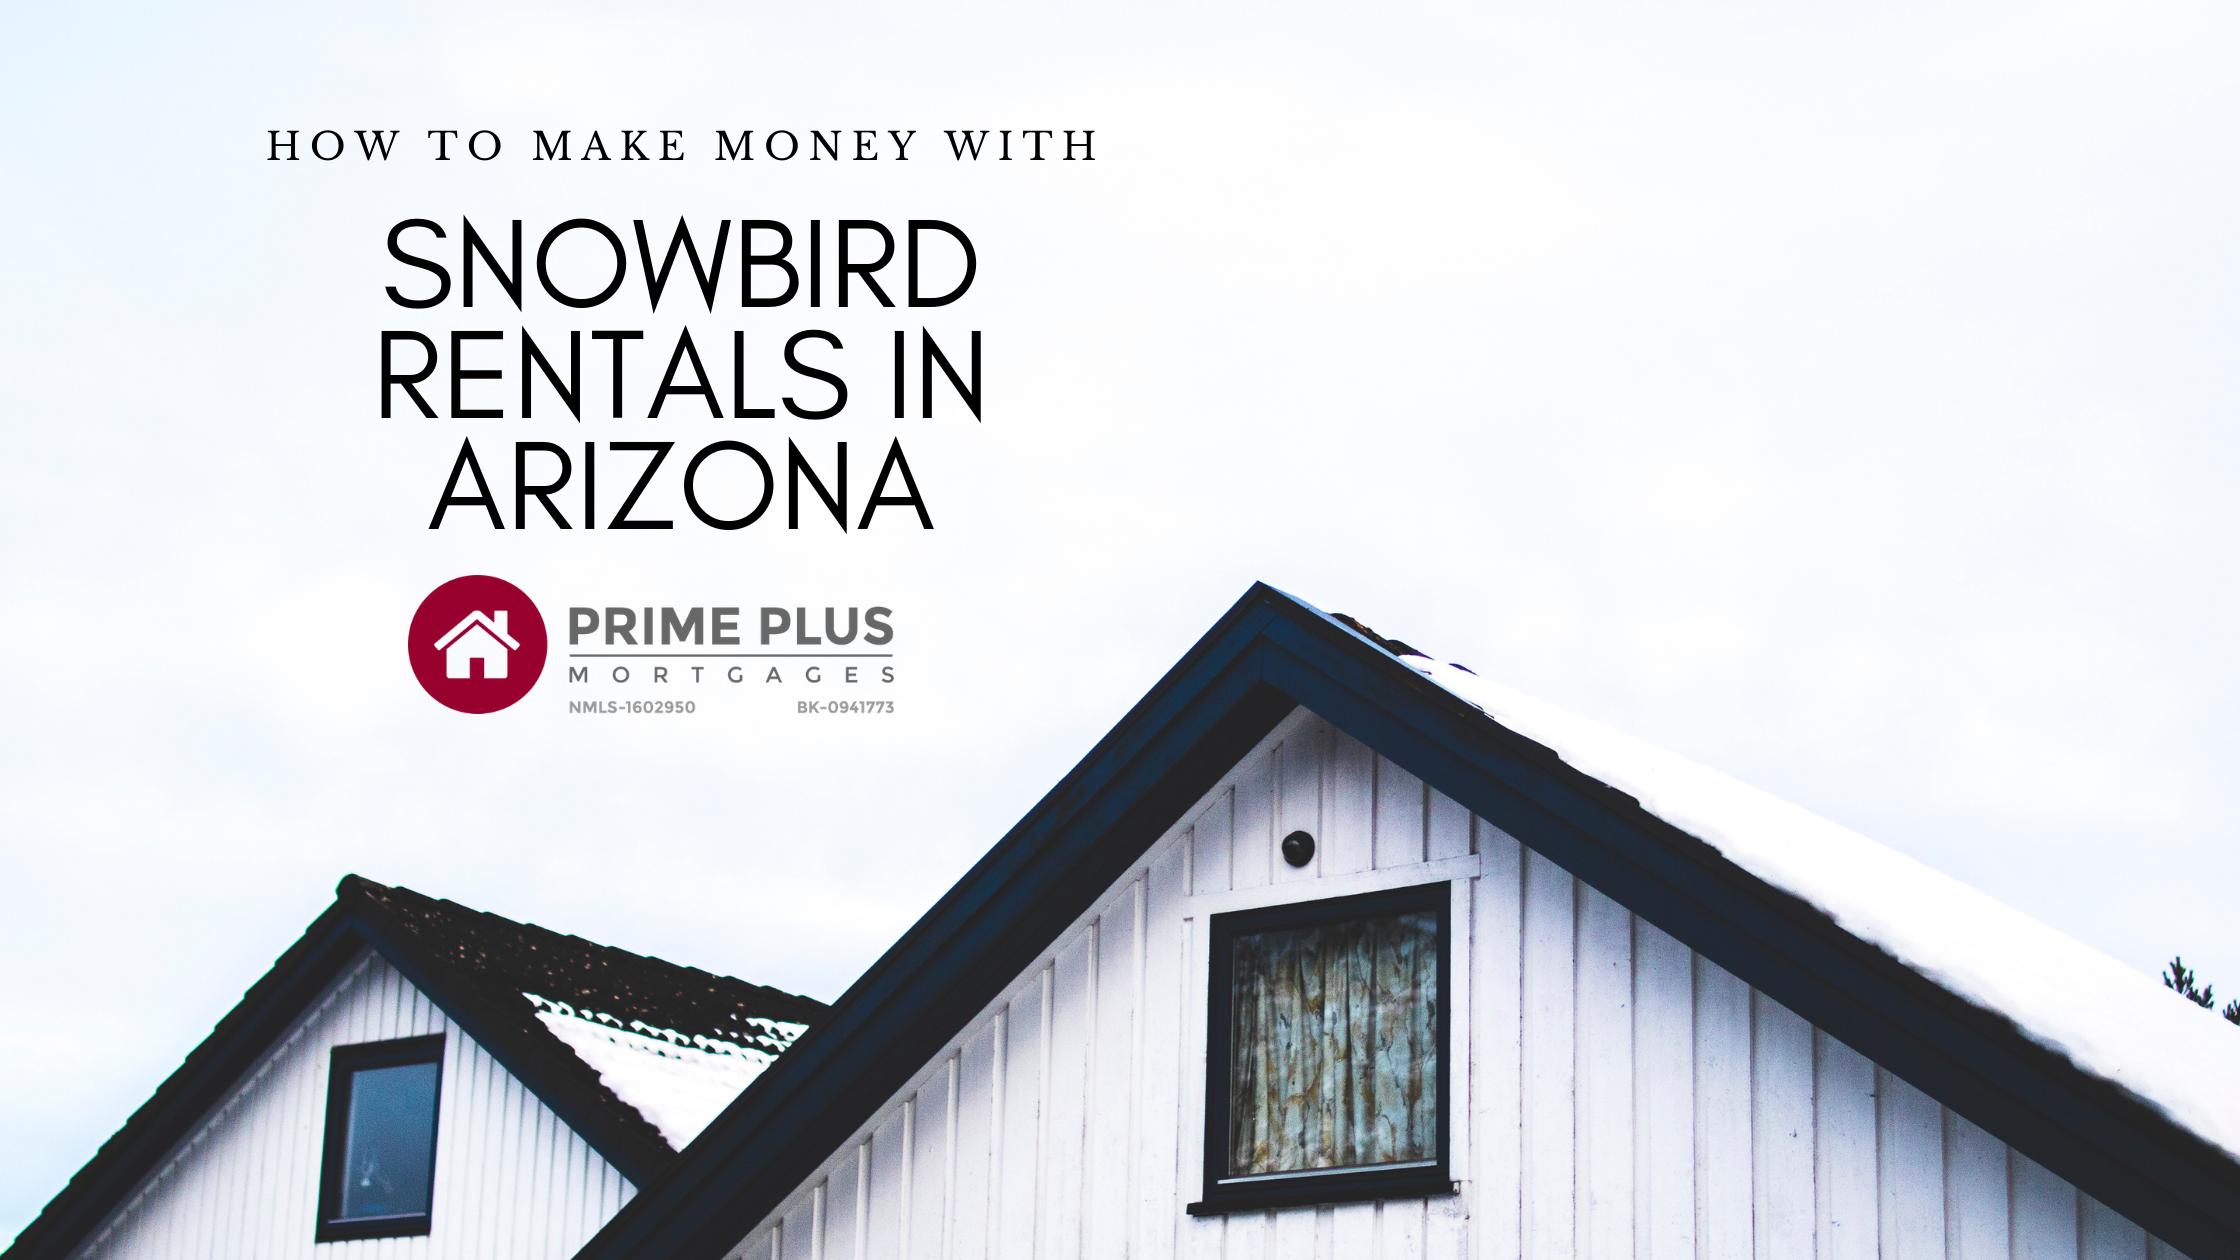 snowbird rentals in arizona